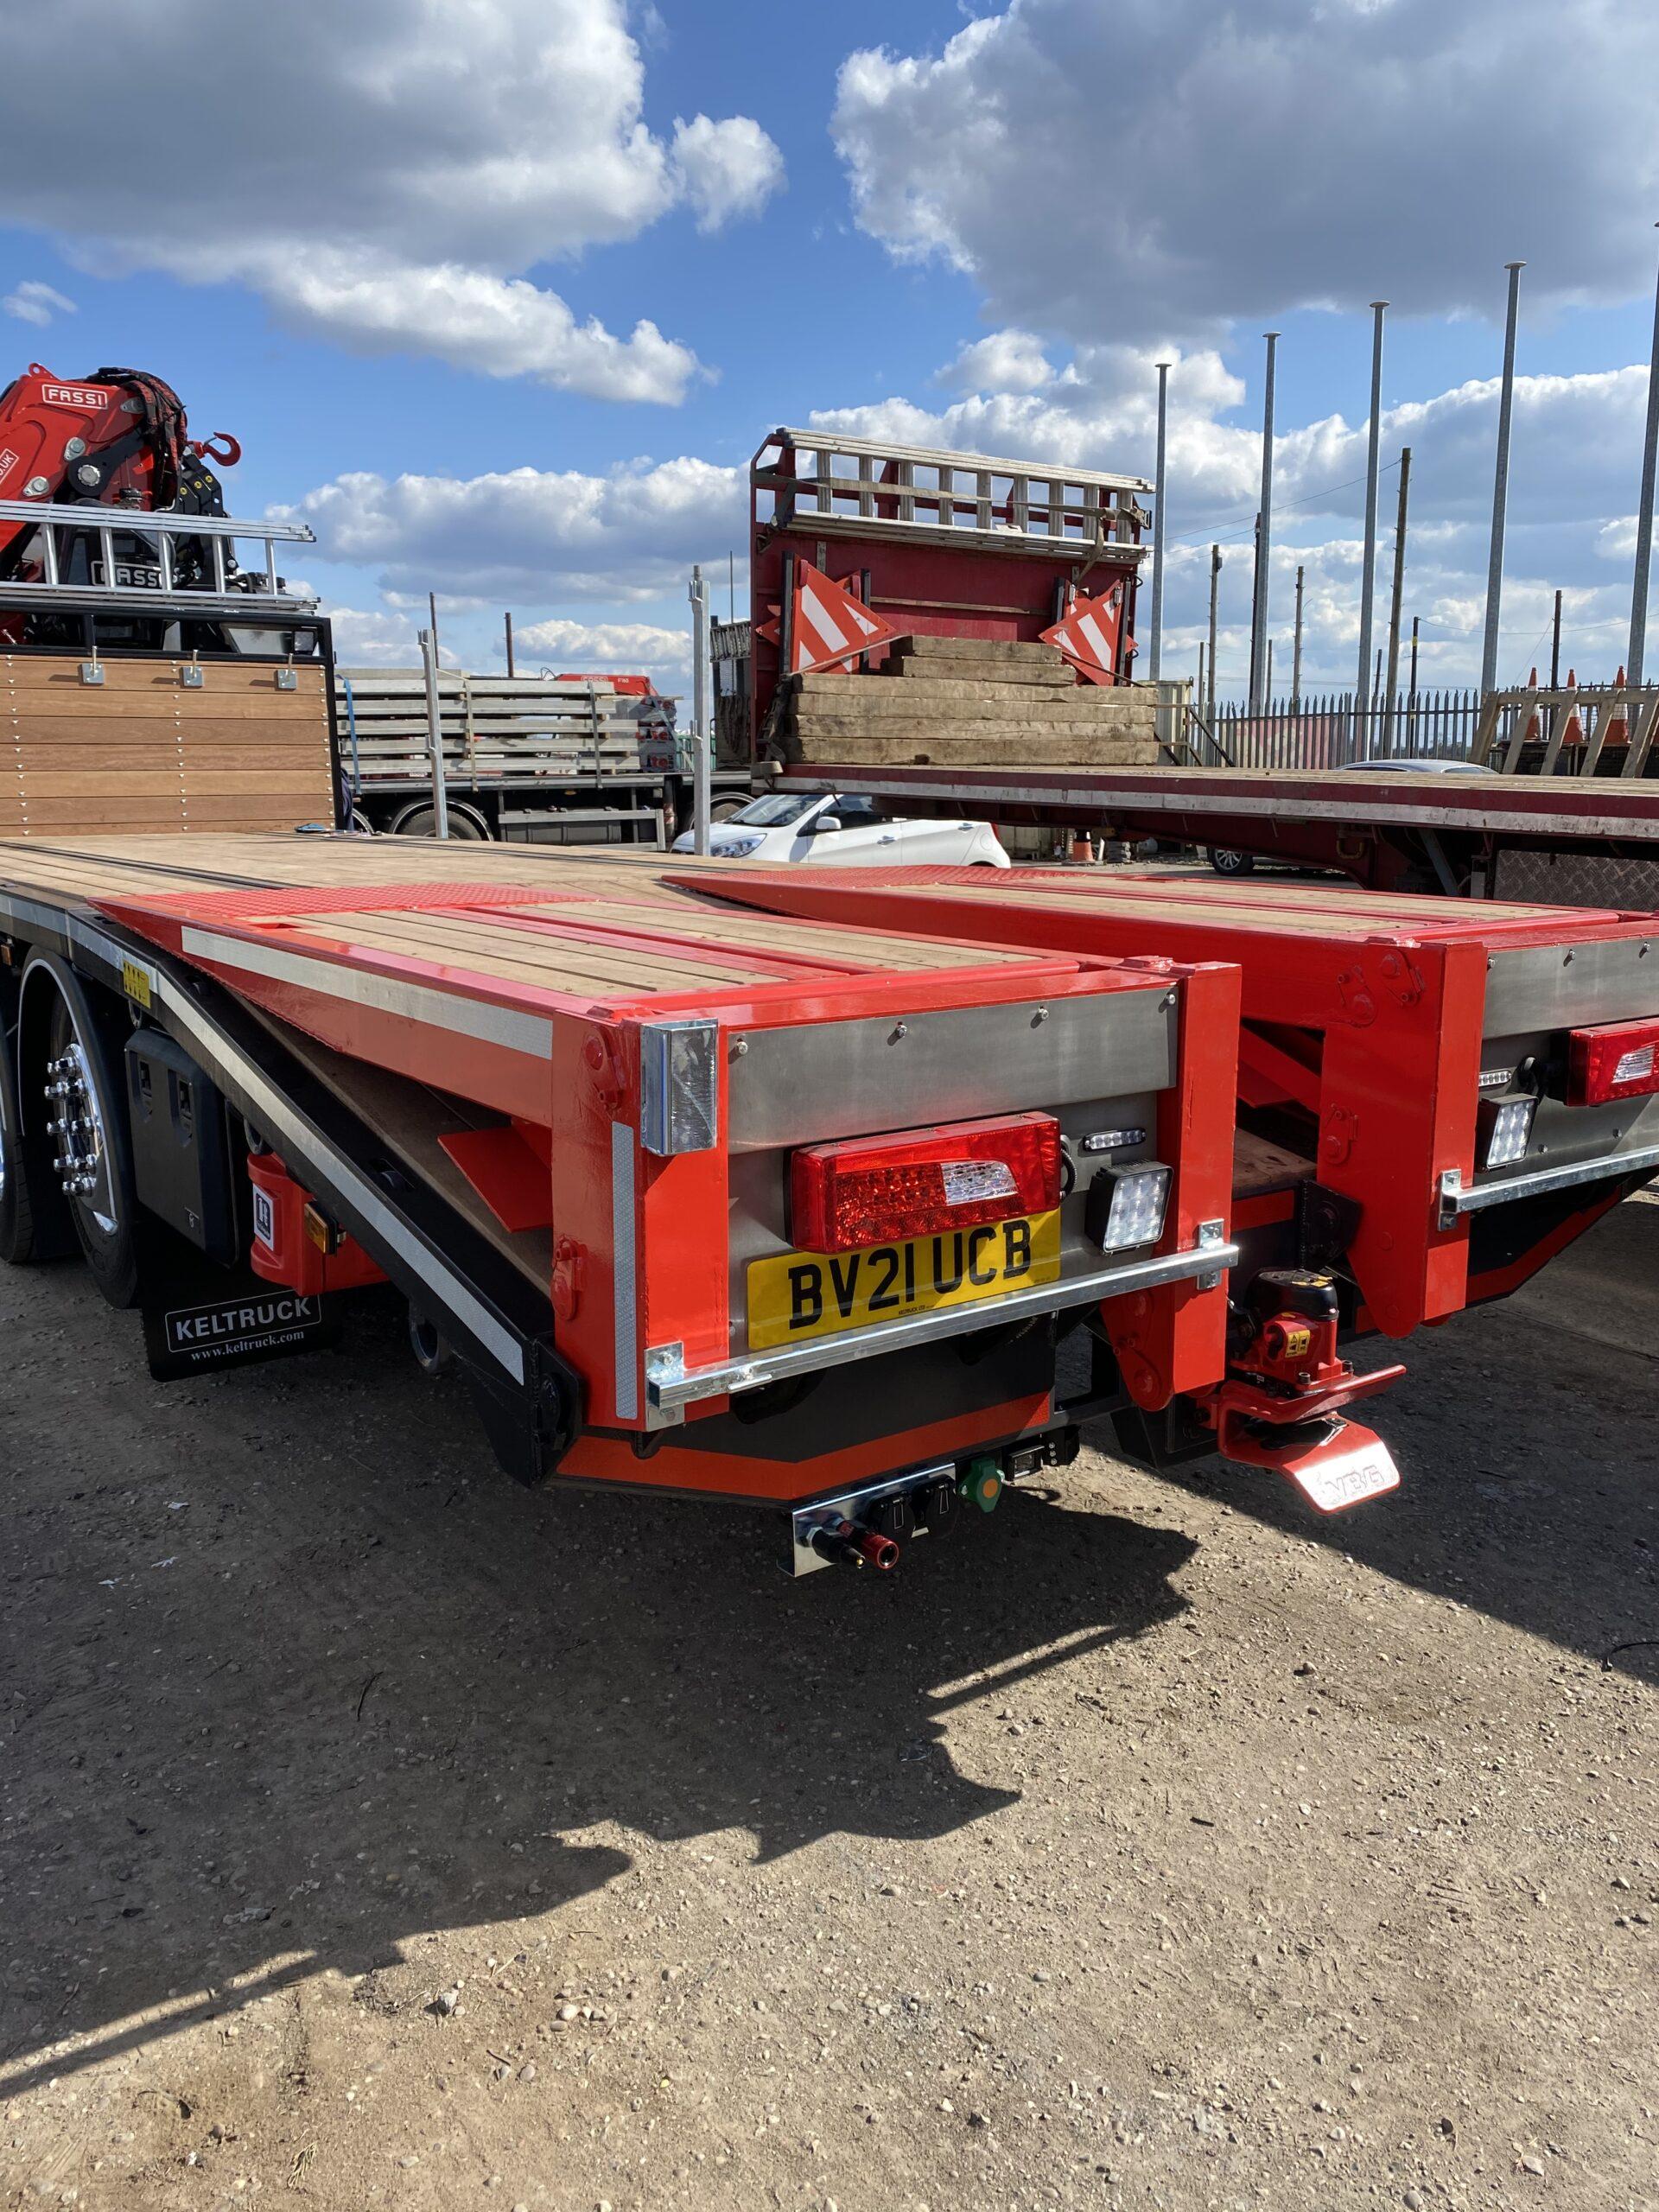 Scania P450 32000kgs